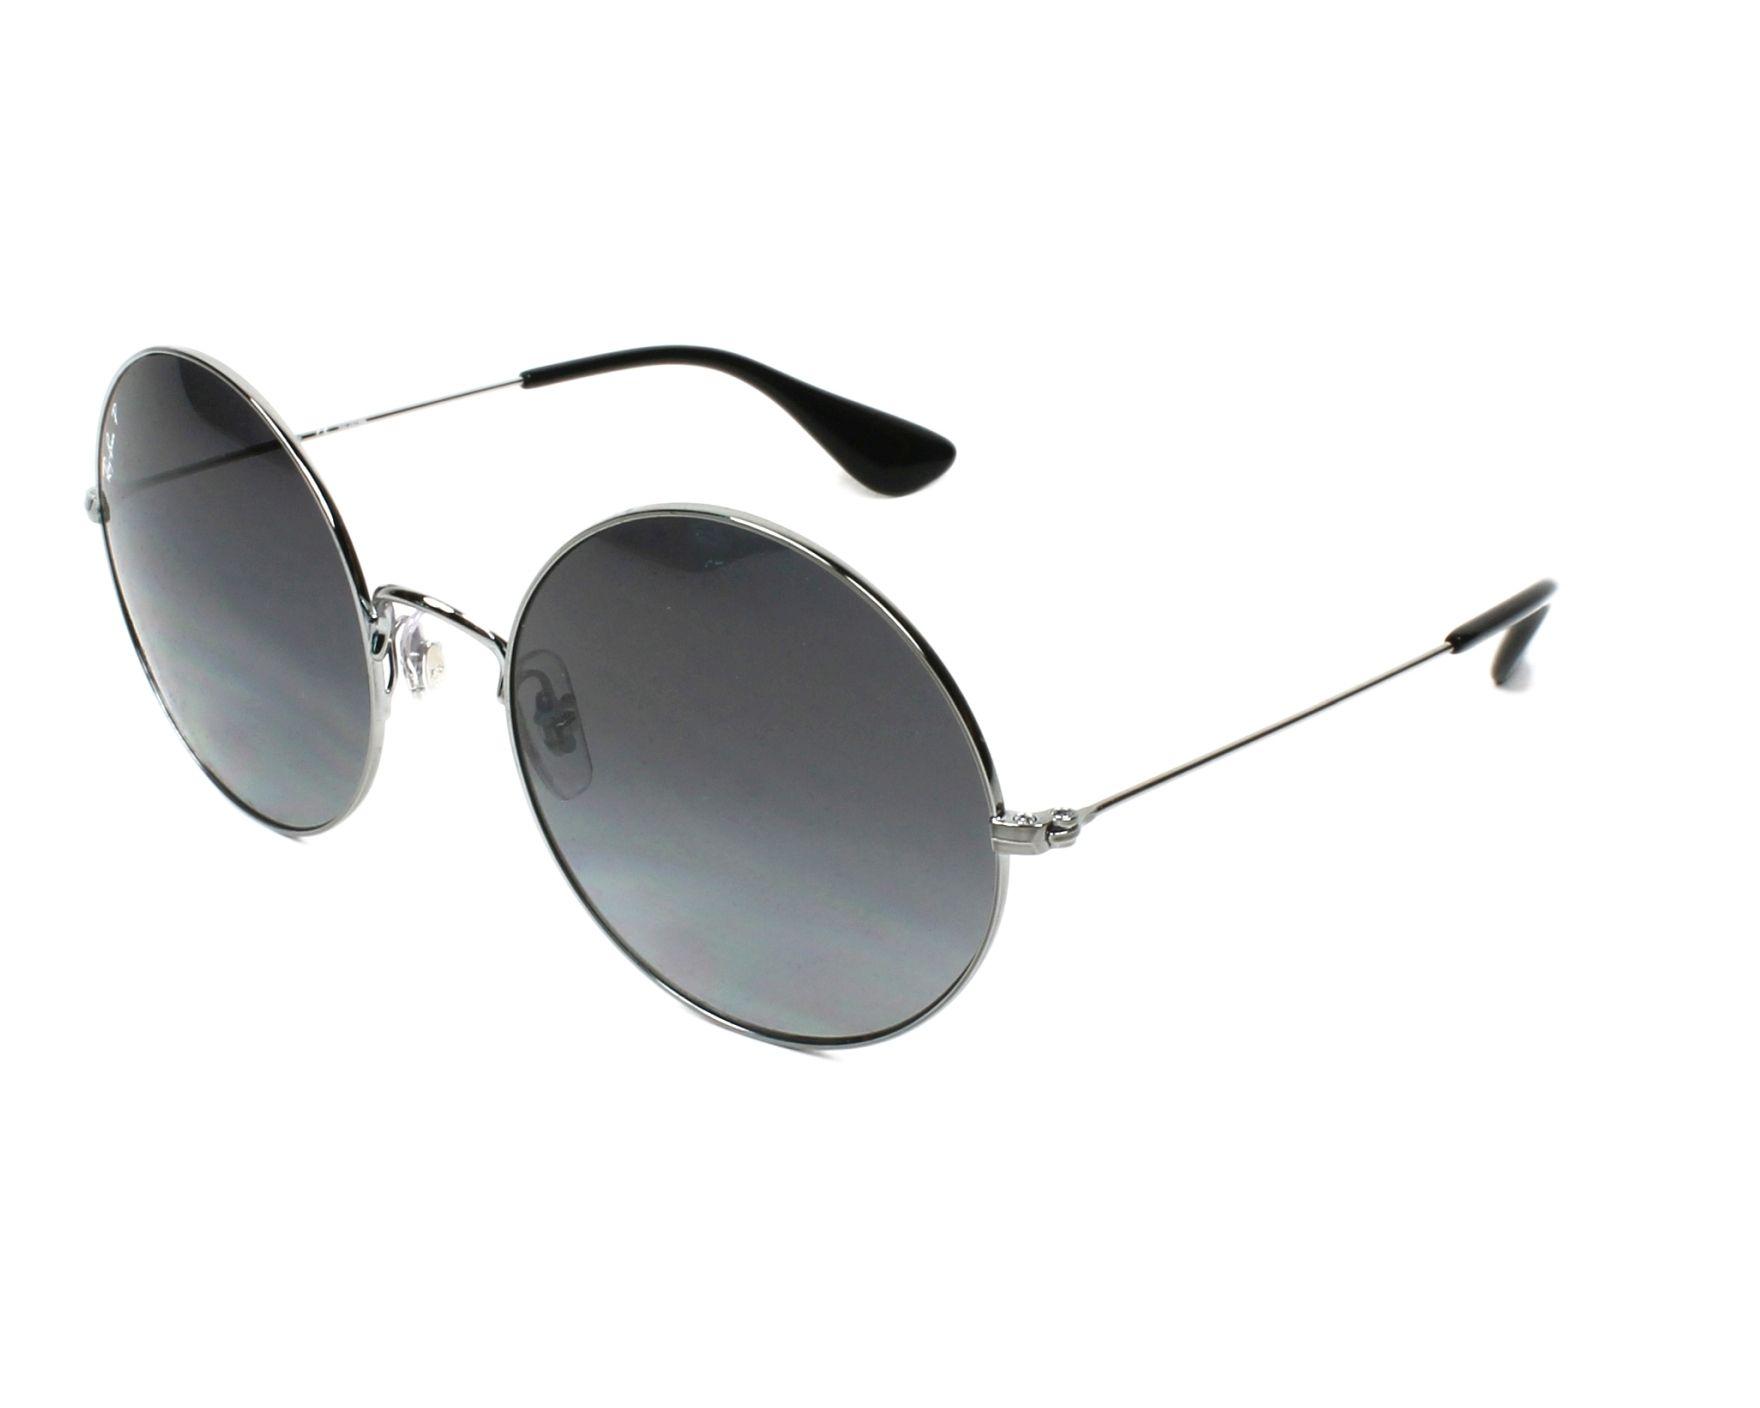 c3dad308c Sunglasses Ray-Ban RB-3592 004/T3 50-20 Gun profile view